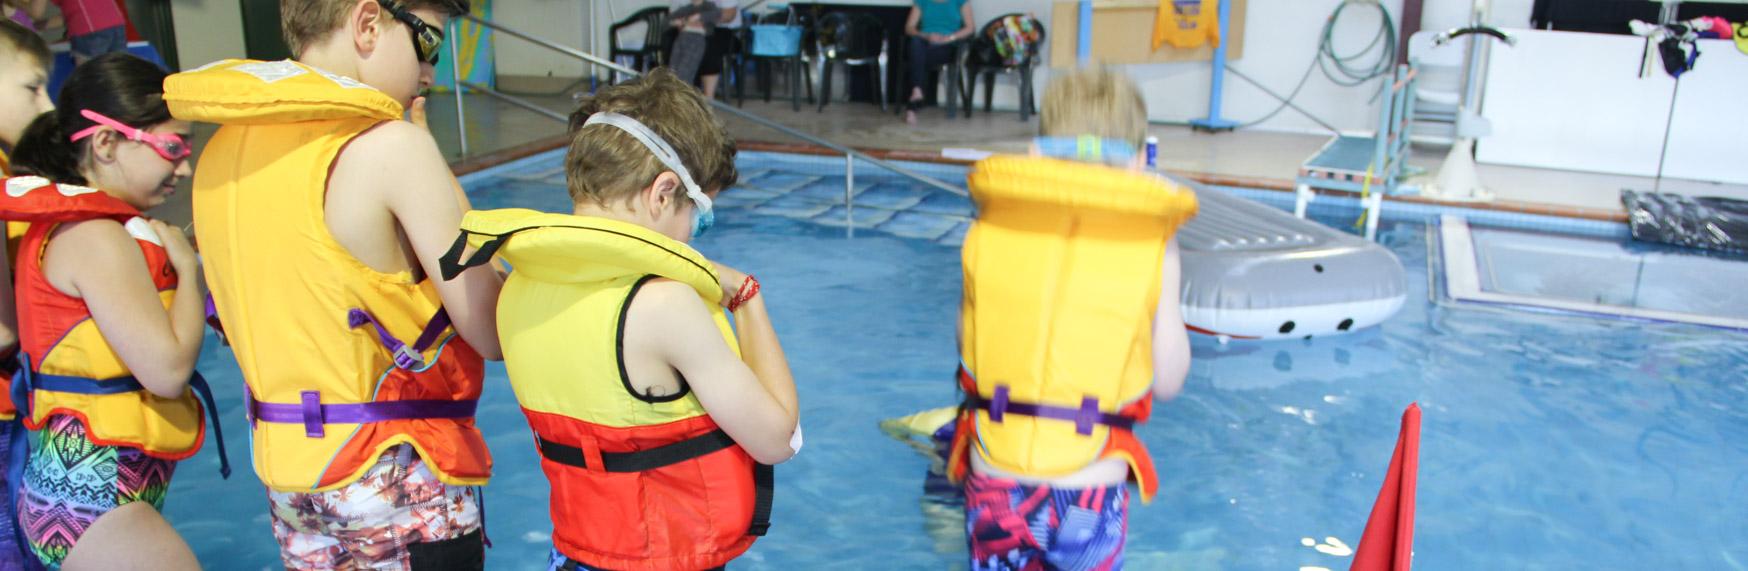 Swimming Lessons | Award Swim School | Learn to Swim Mount Evelyn